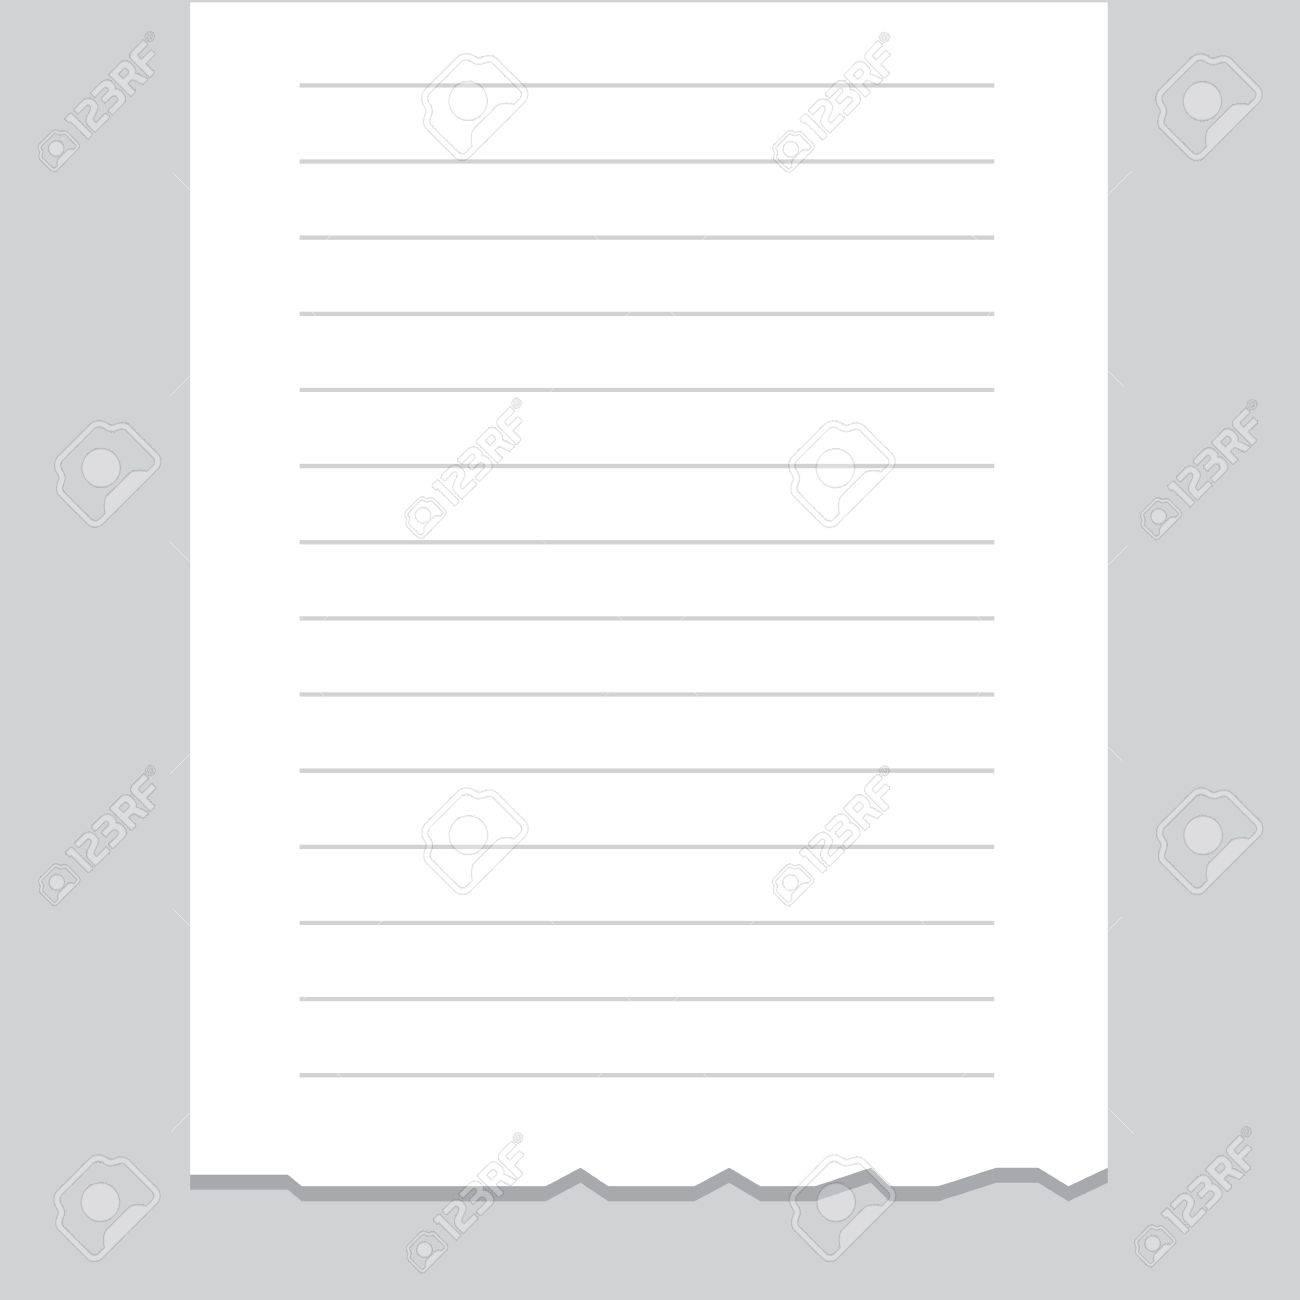 Empty receipt printout with torn bottom edge - 18982983